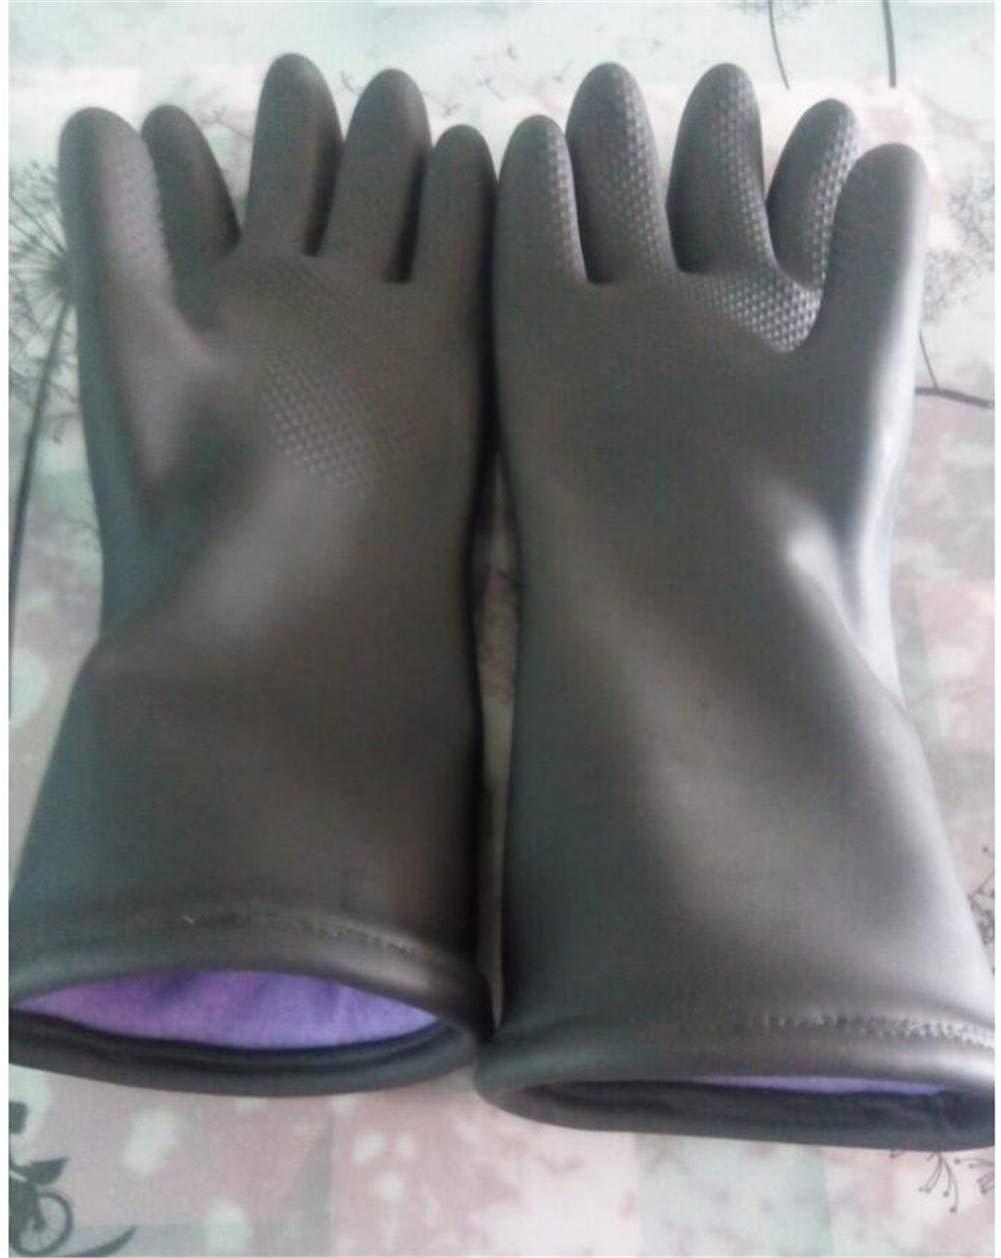 HAOLY 抗バイト手袋 犬のトレーニング用 猫キャッチPET 動物の防止バイト 保護 厚手の手手手袋 35cm long rko2zf-A35cm long B07K548KW4 A 35cm long